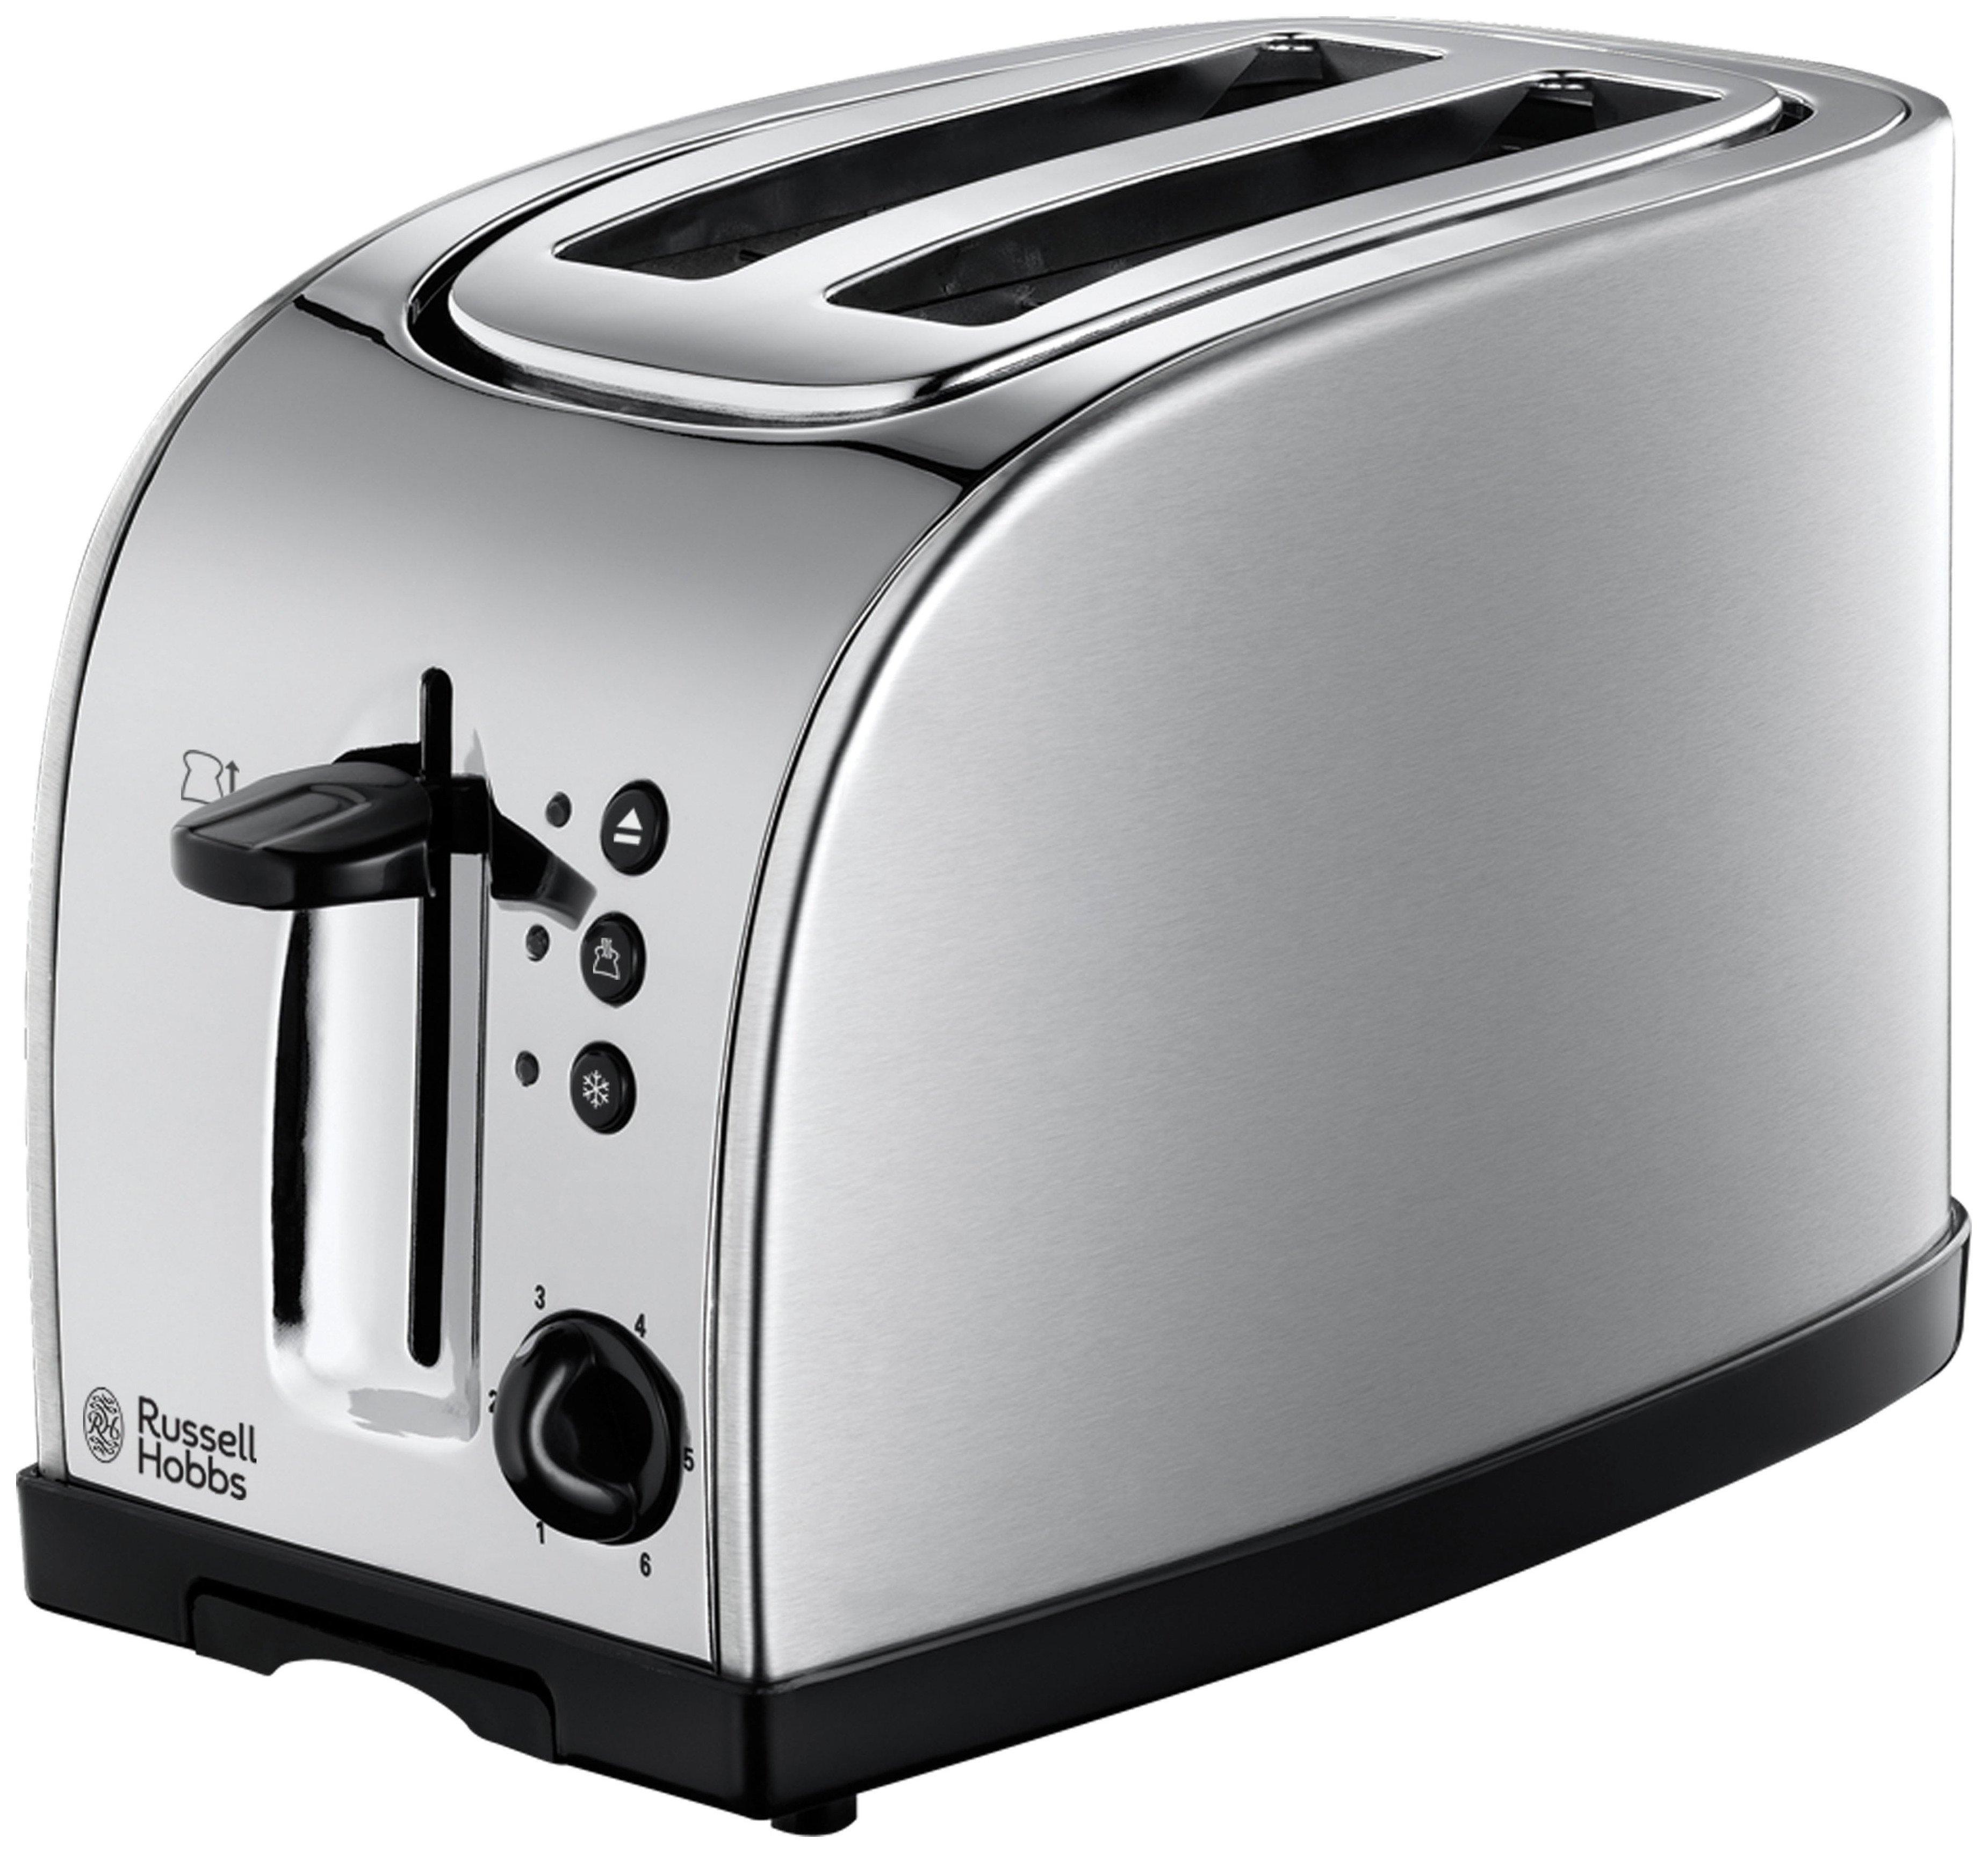 Russell Hobbs 18096 Texas Wide Slot 2 Slice Toaster - Steel